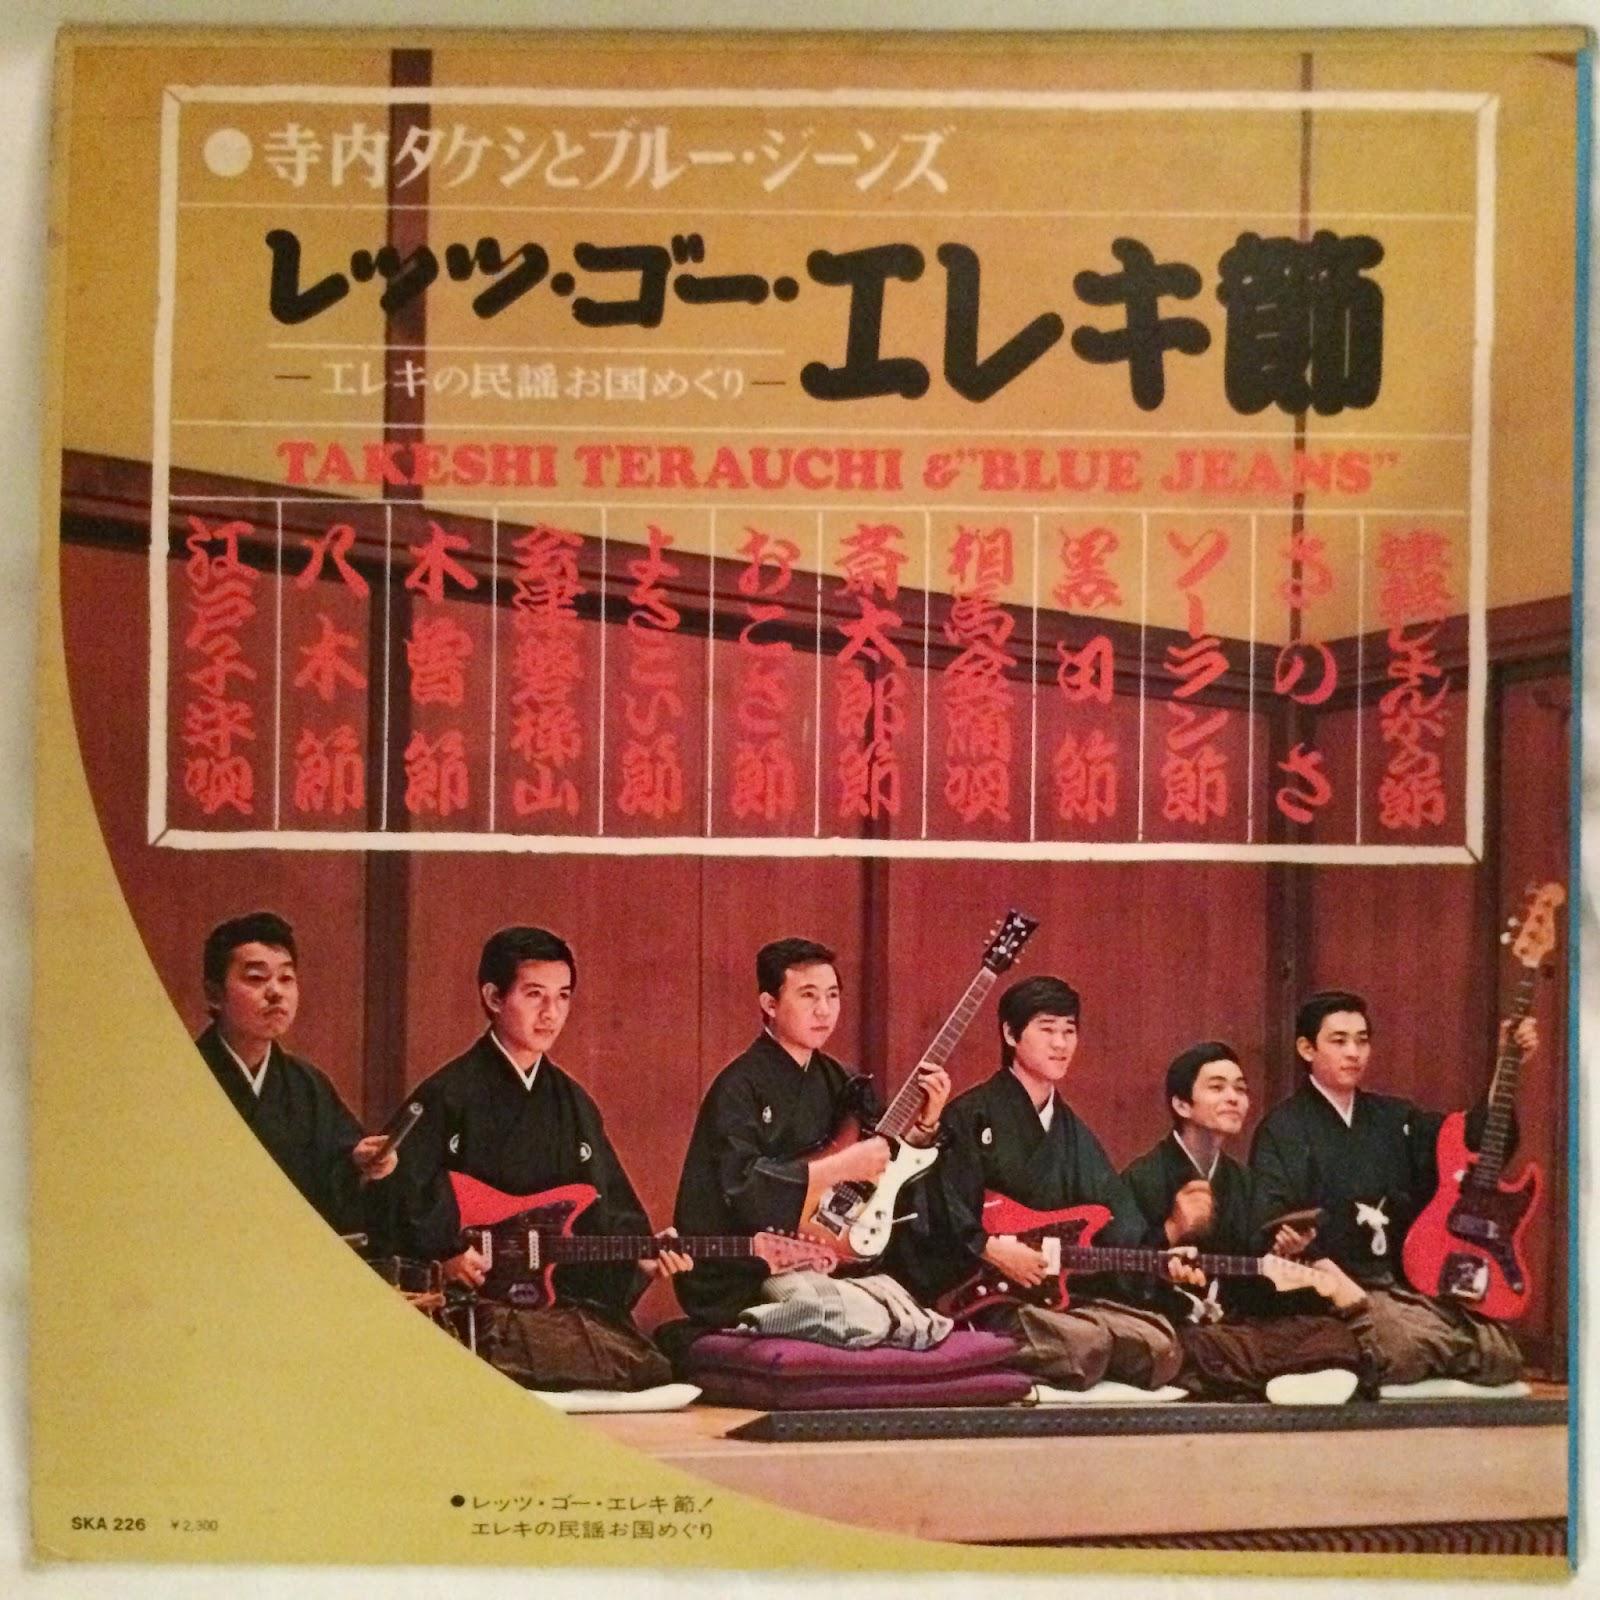 Takeshi Terauchi & Blue Jeans - Let's Go Eleki-Bushi